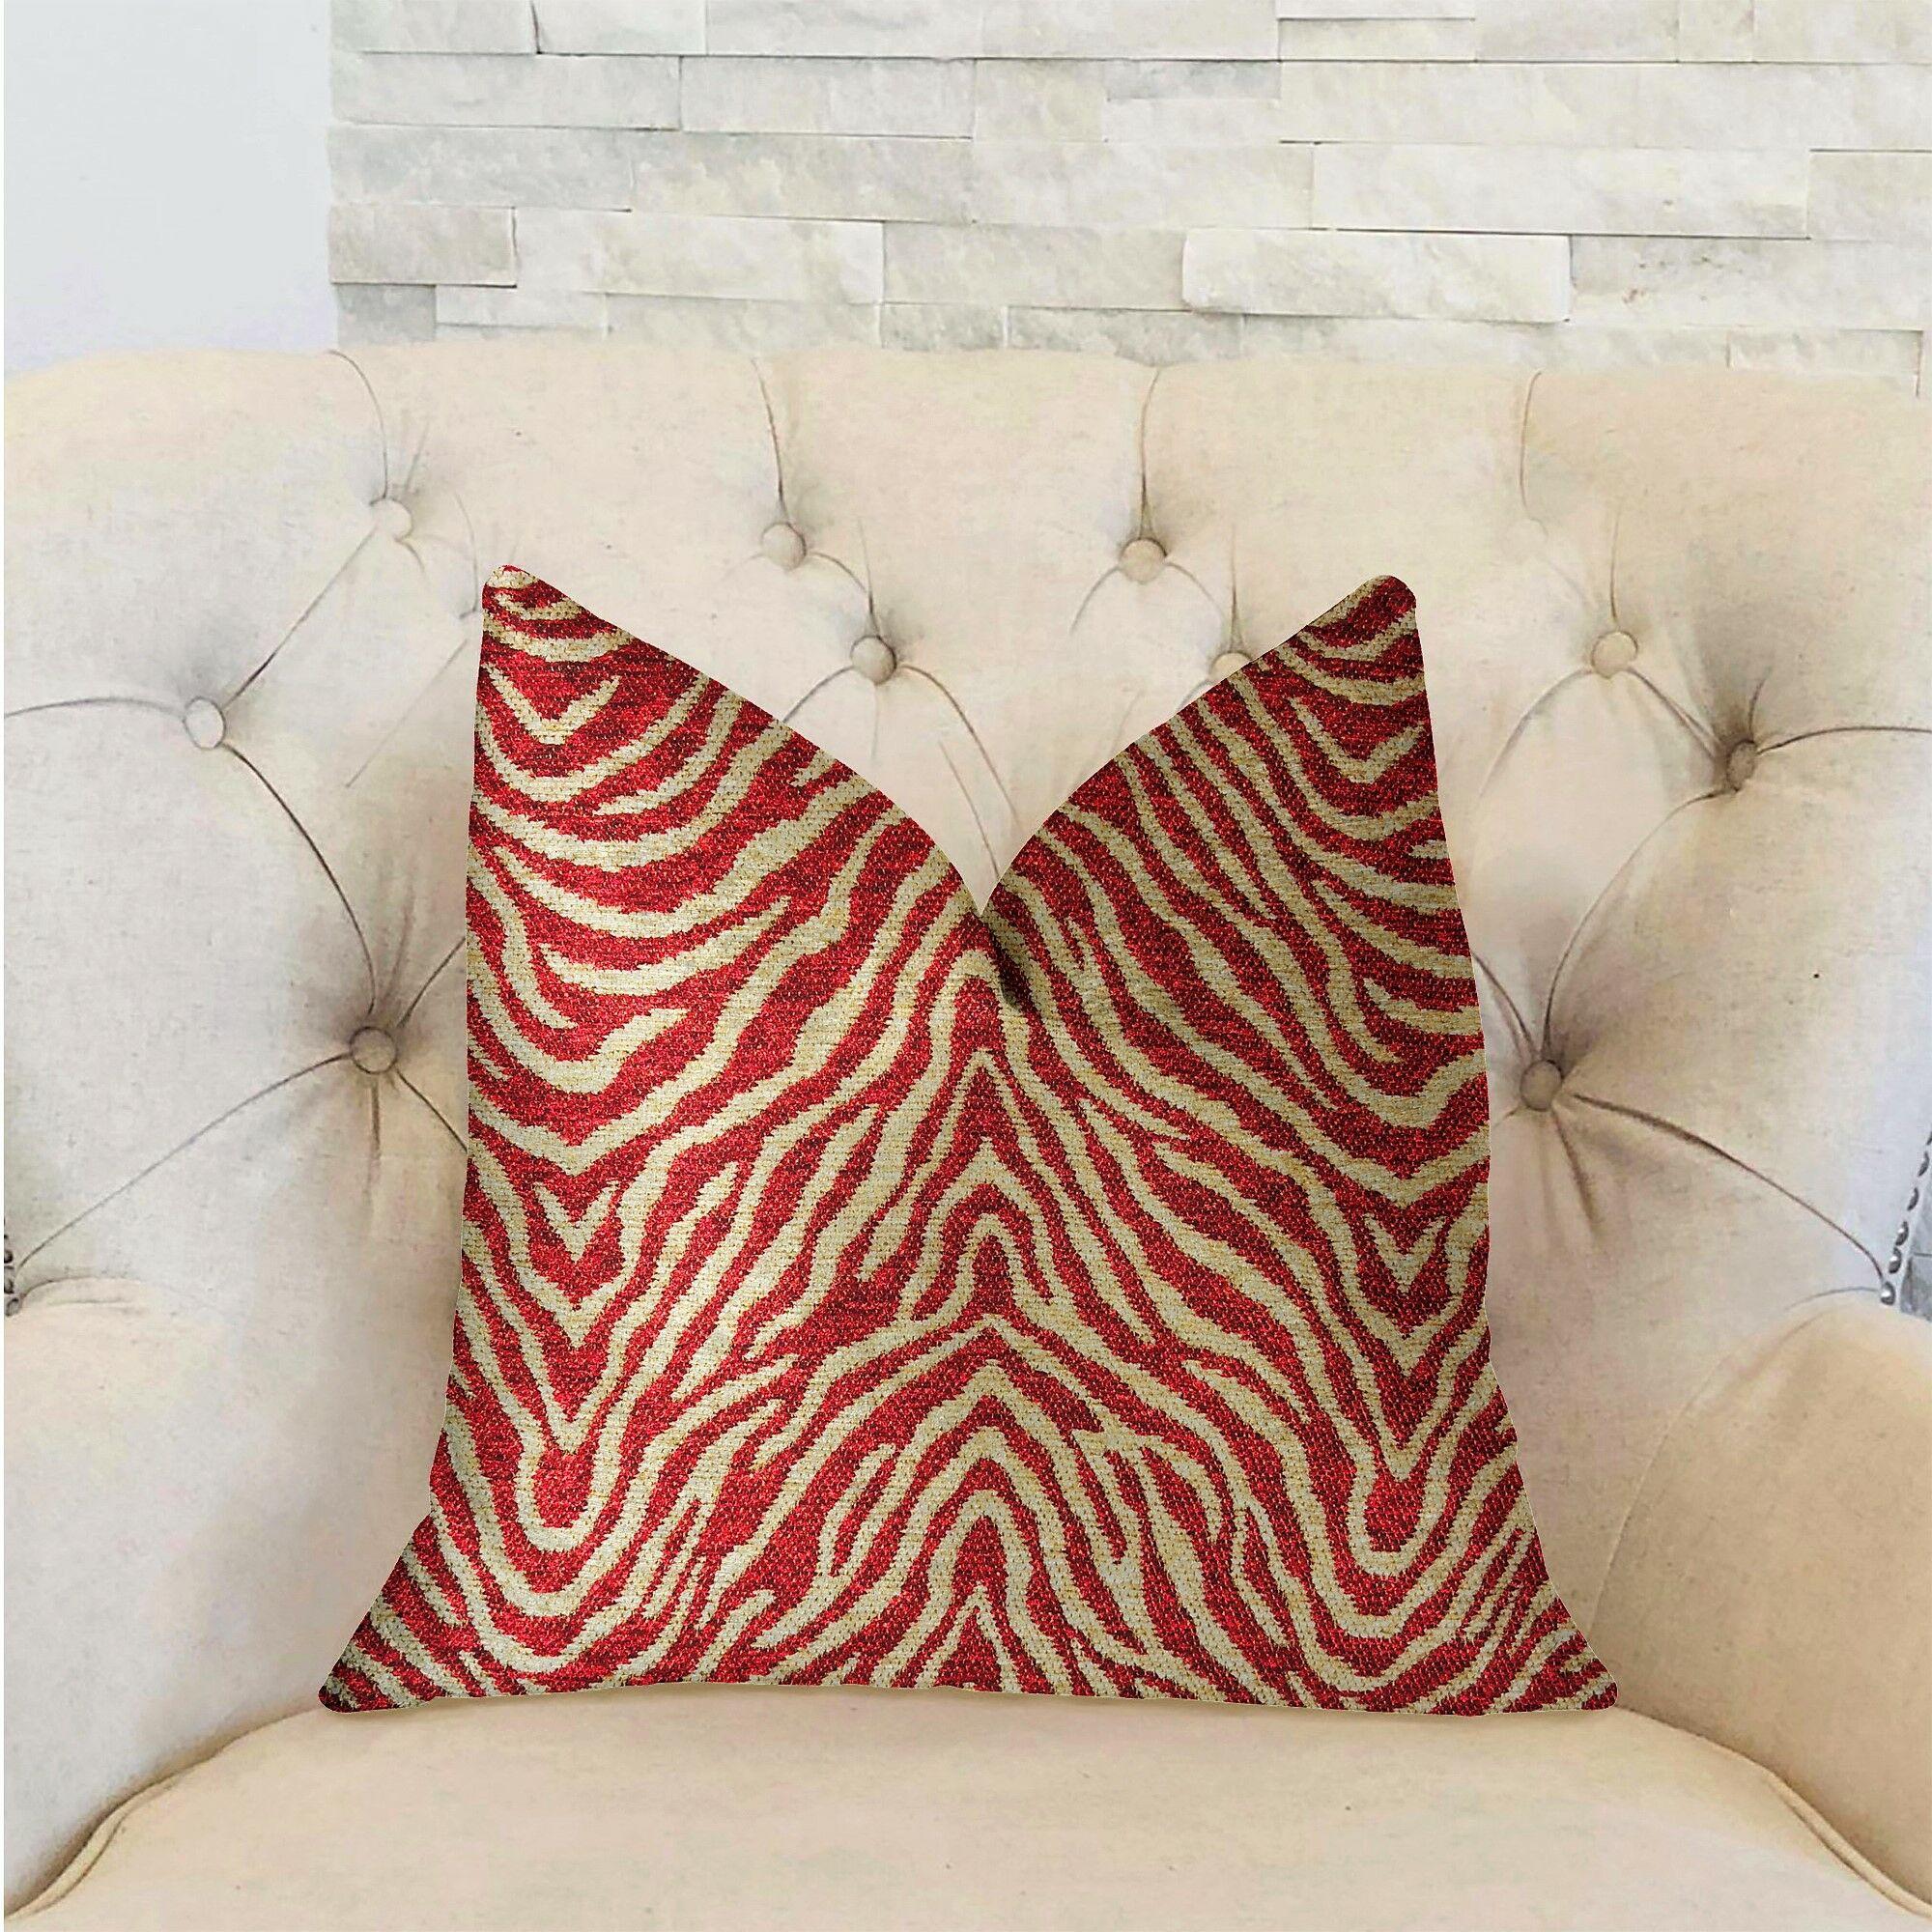 Alhambra Luxury Pillow Size: 20